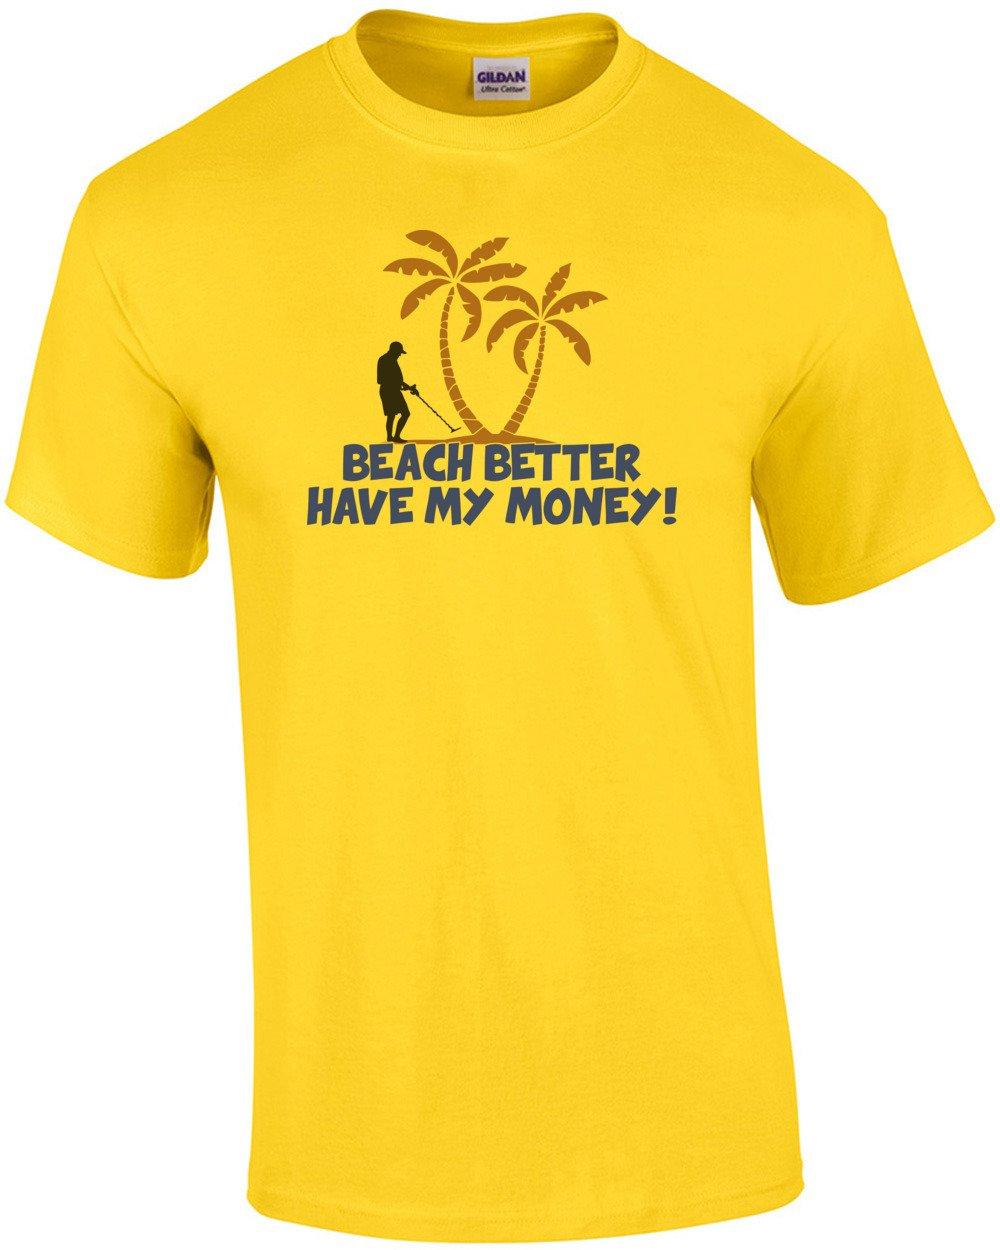 Beach Better Have My Money 7498 Shirts